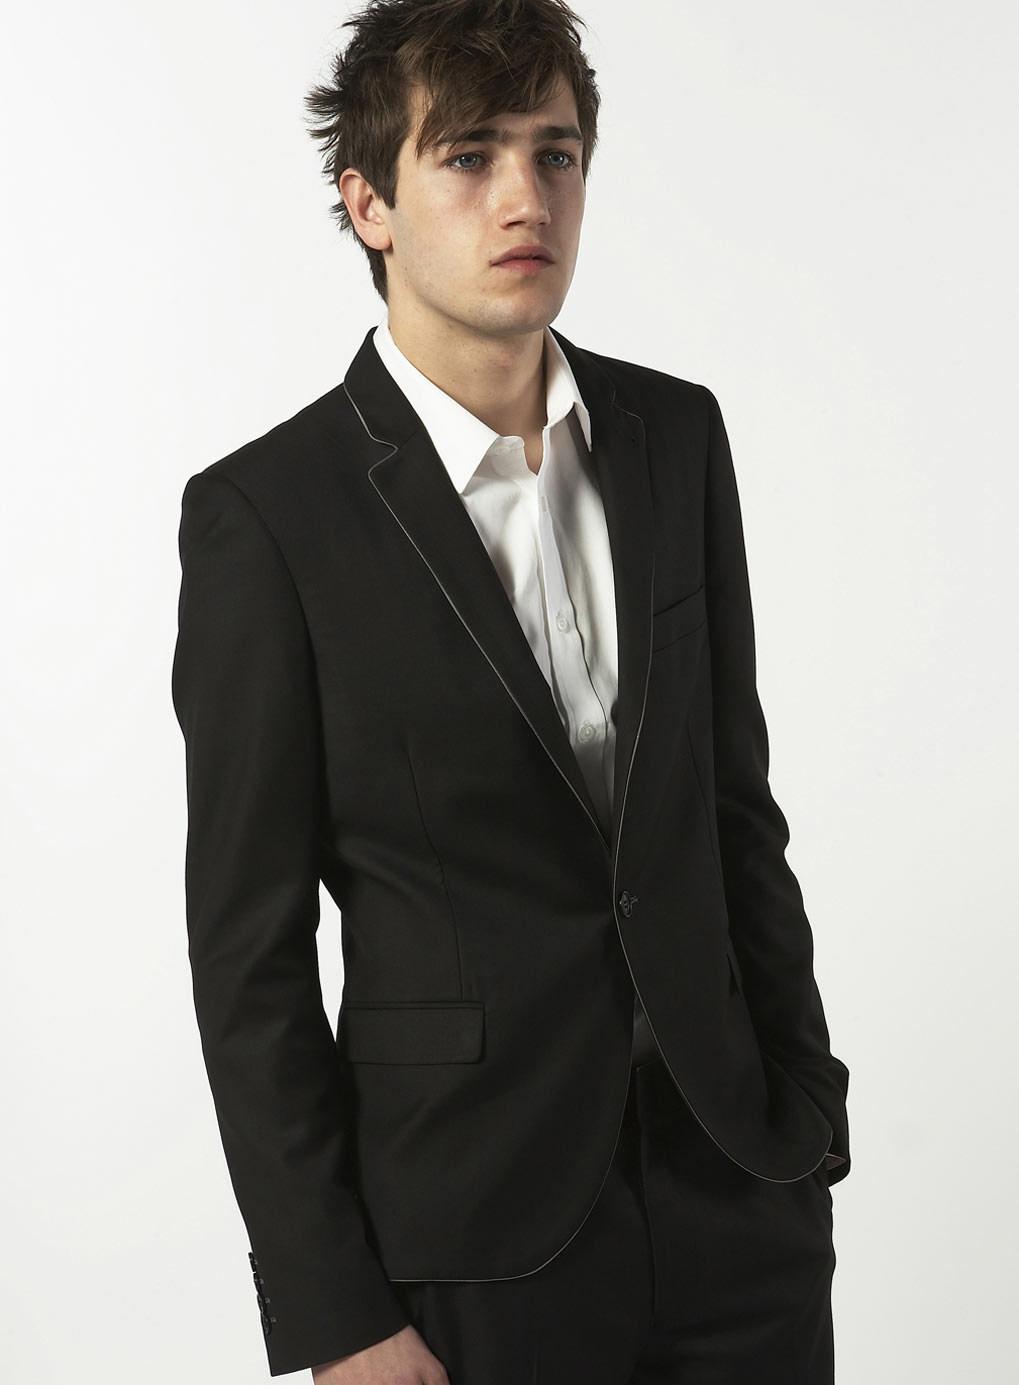 for men  u201cdress to impress u201d   u2013 stylert com